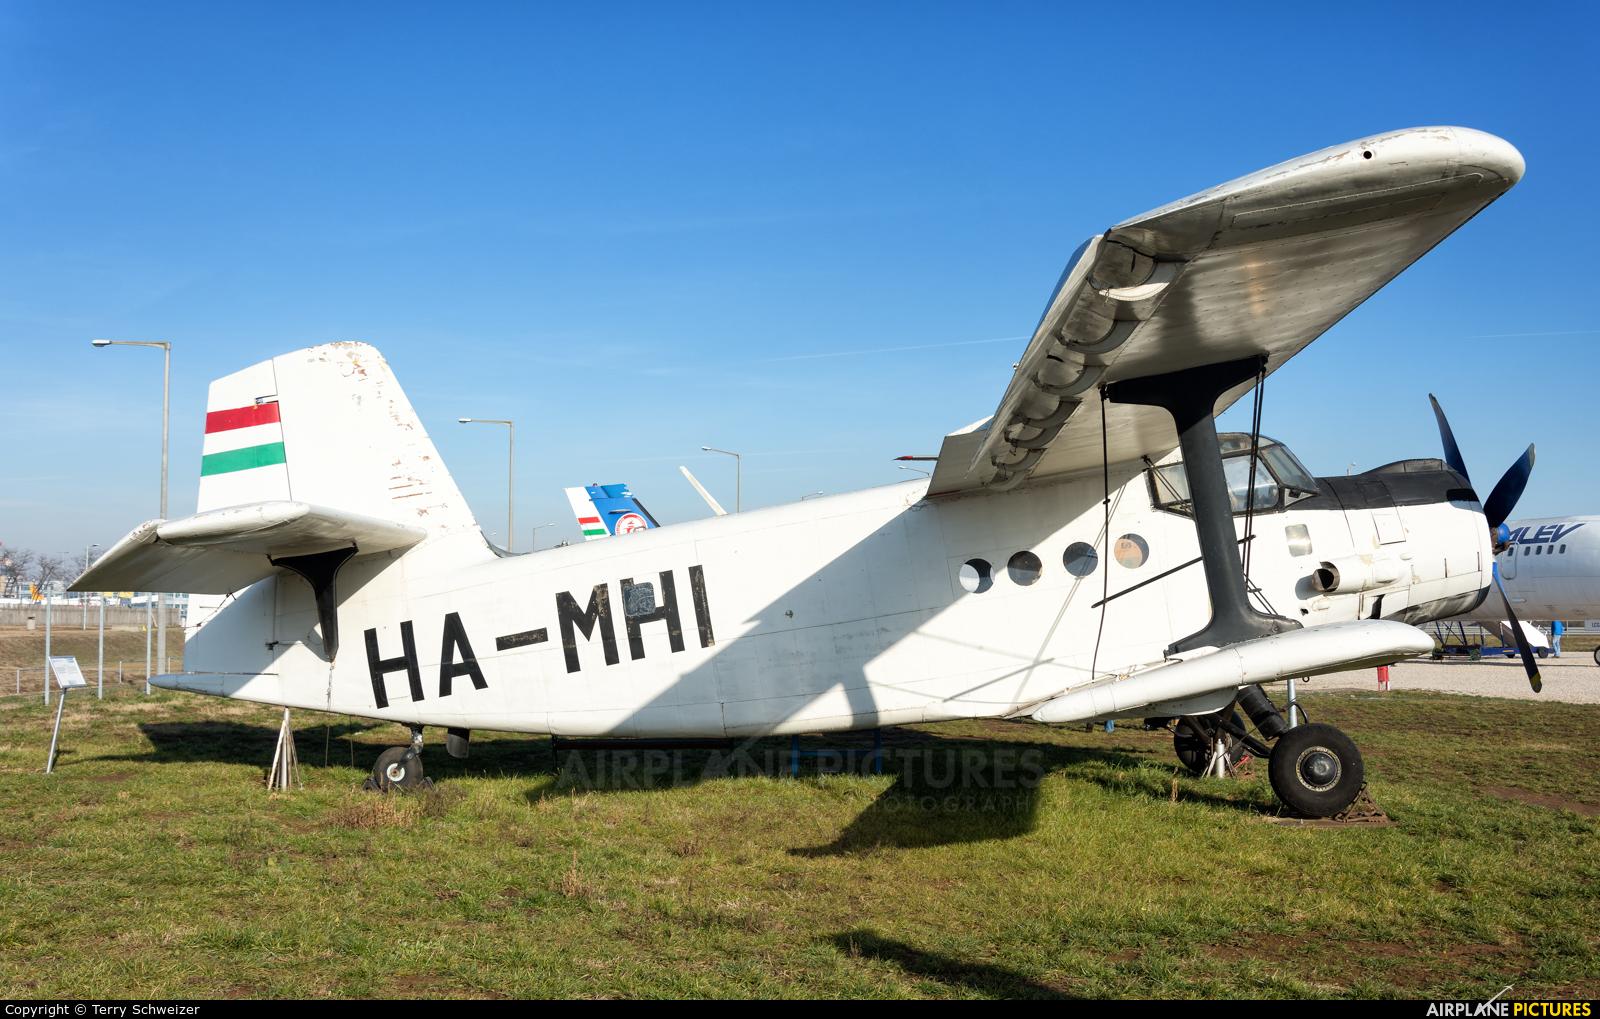 Budapest Aircraft Service HA-MHI aircraft at Budapest Ferihegy Museum